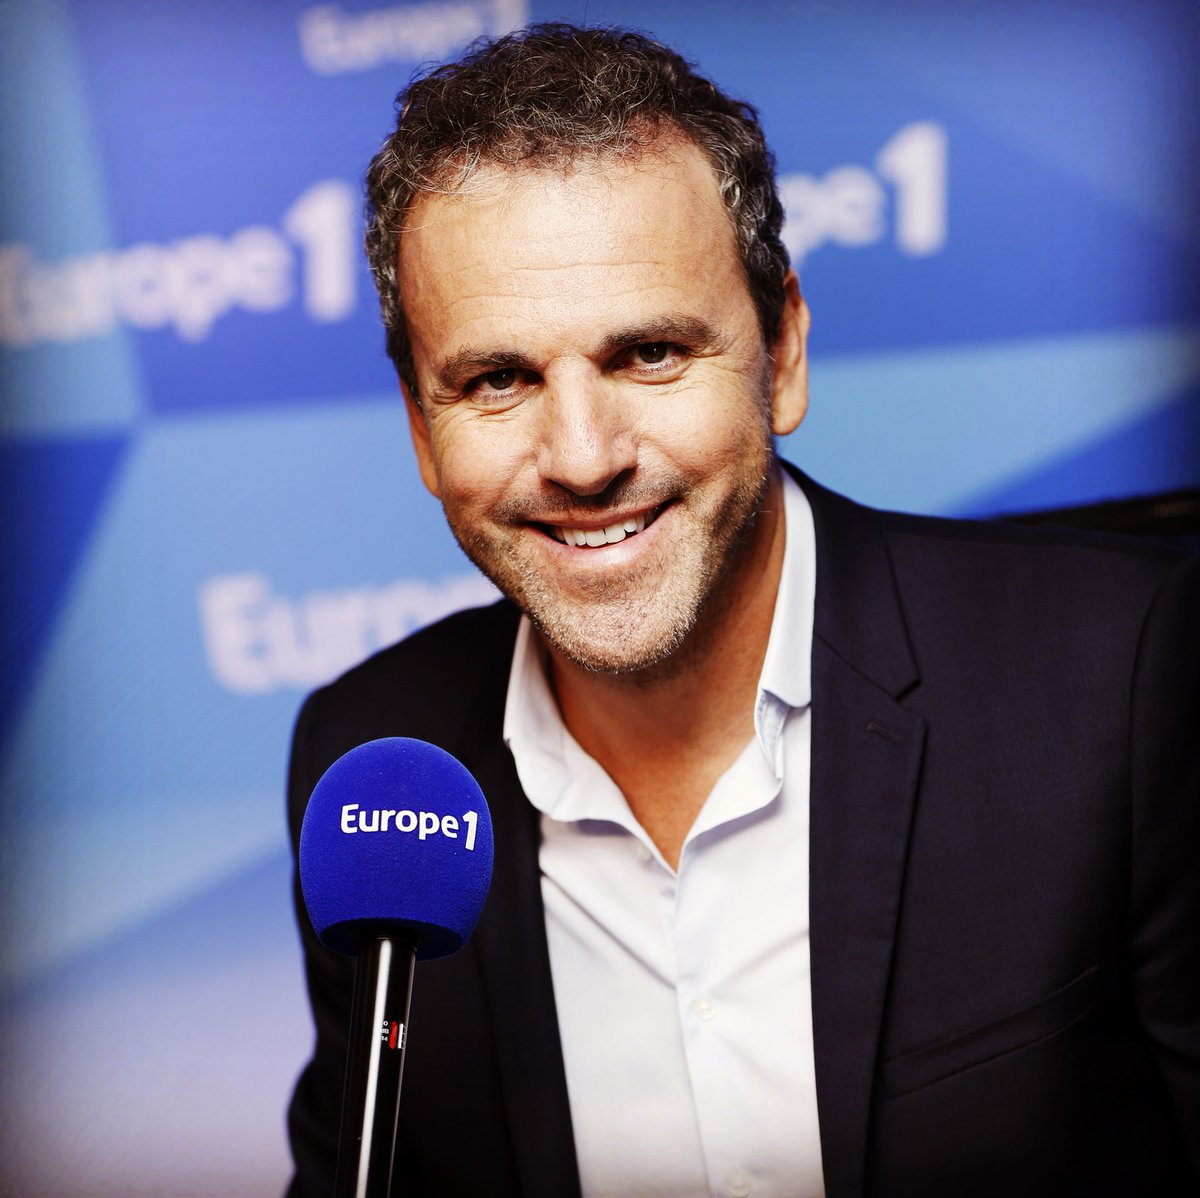 Retrouvez @lionelrosso @Europe1Sport #ASSEPSG #foot 20h23h #Europe1